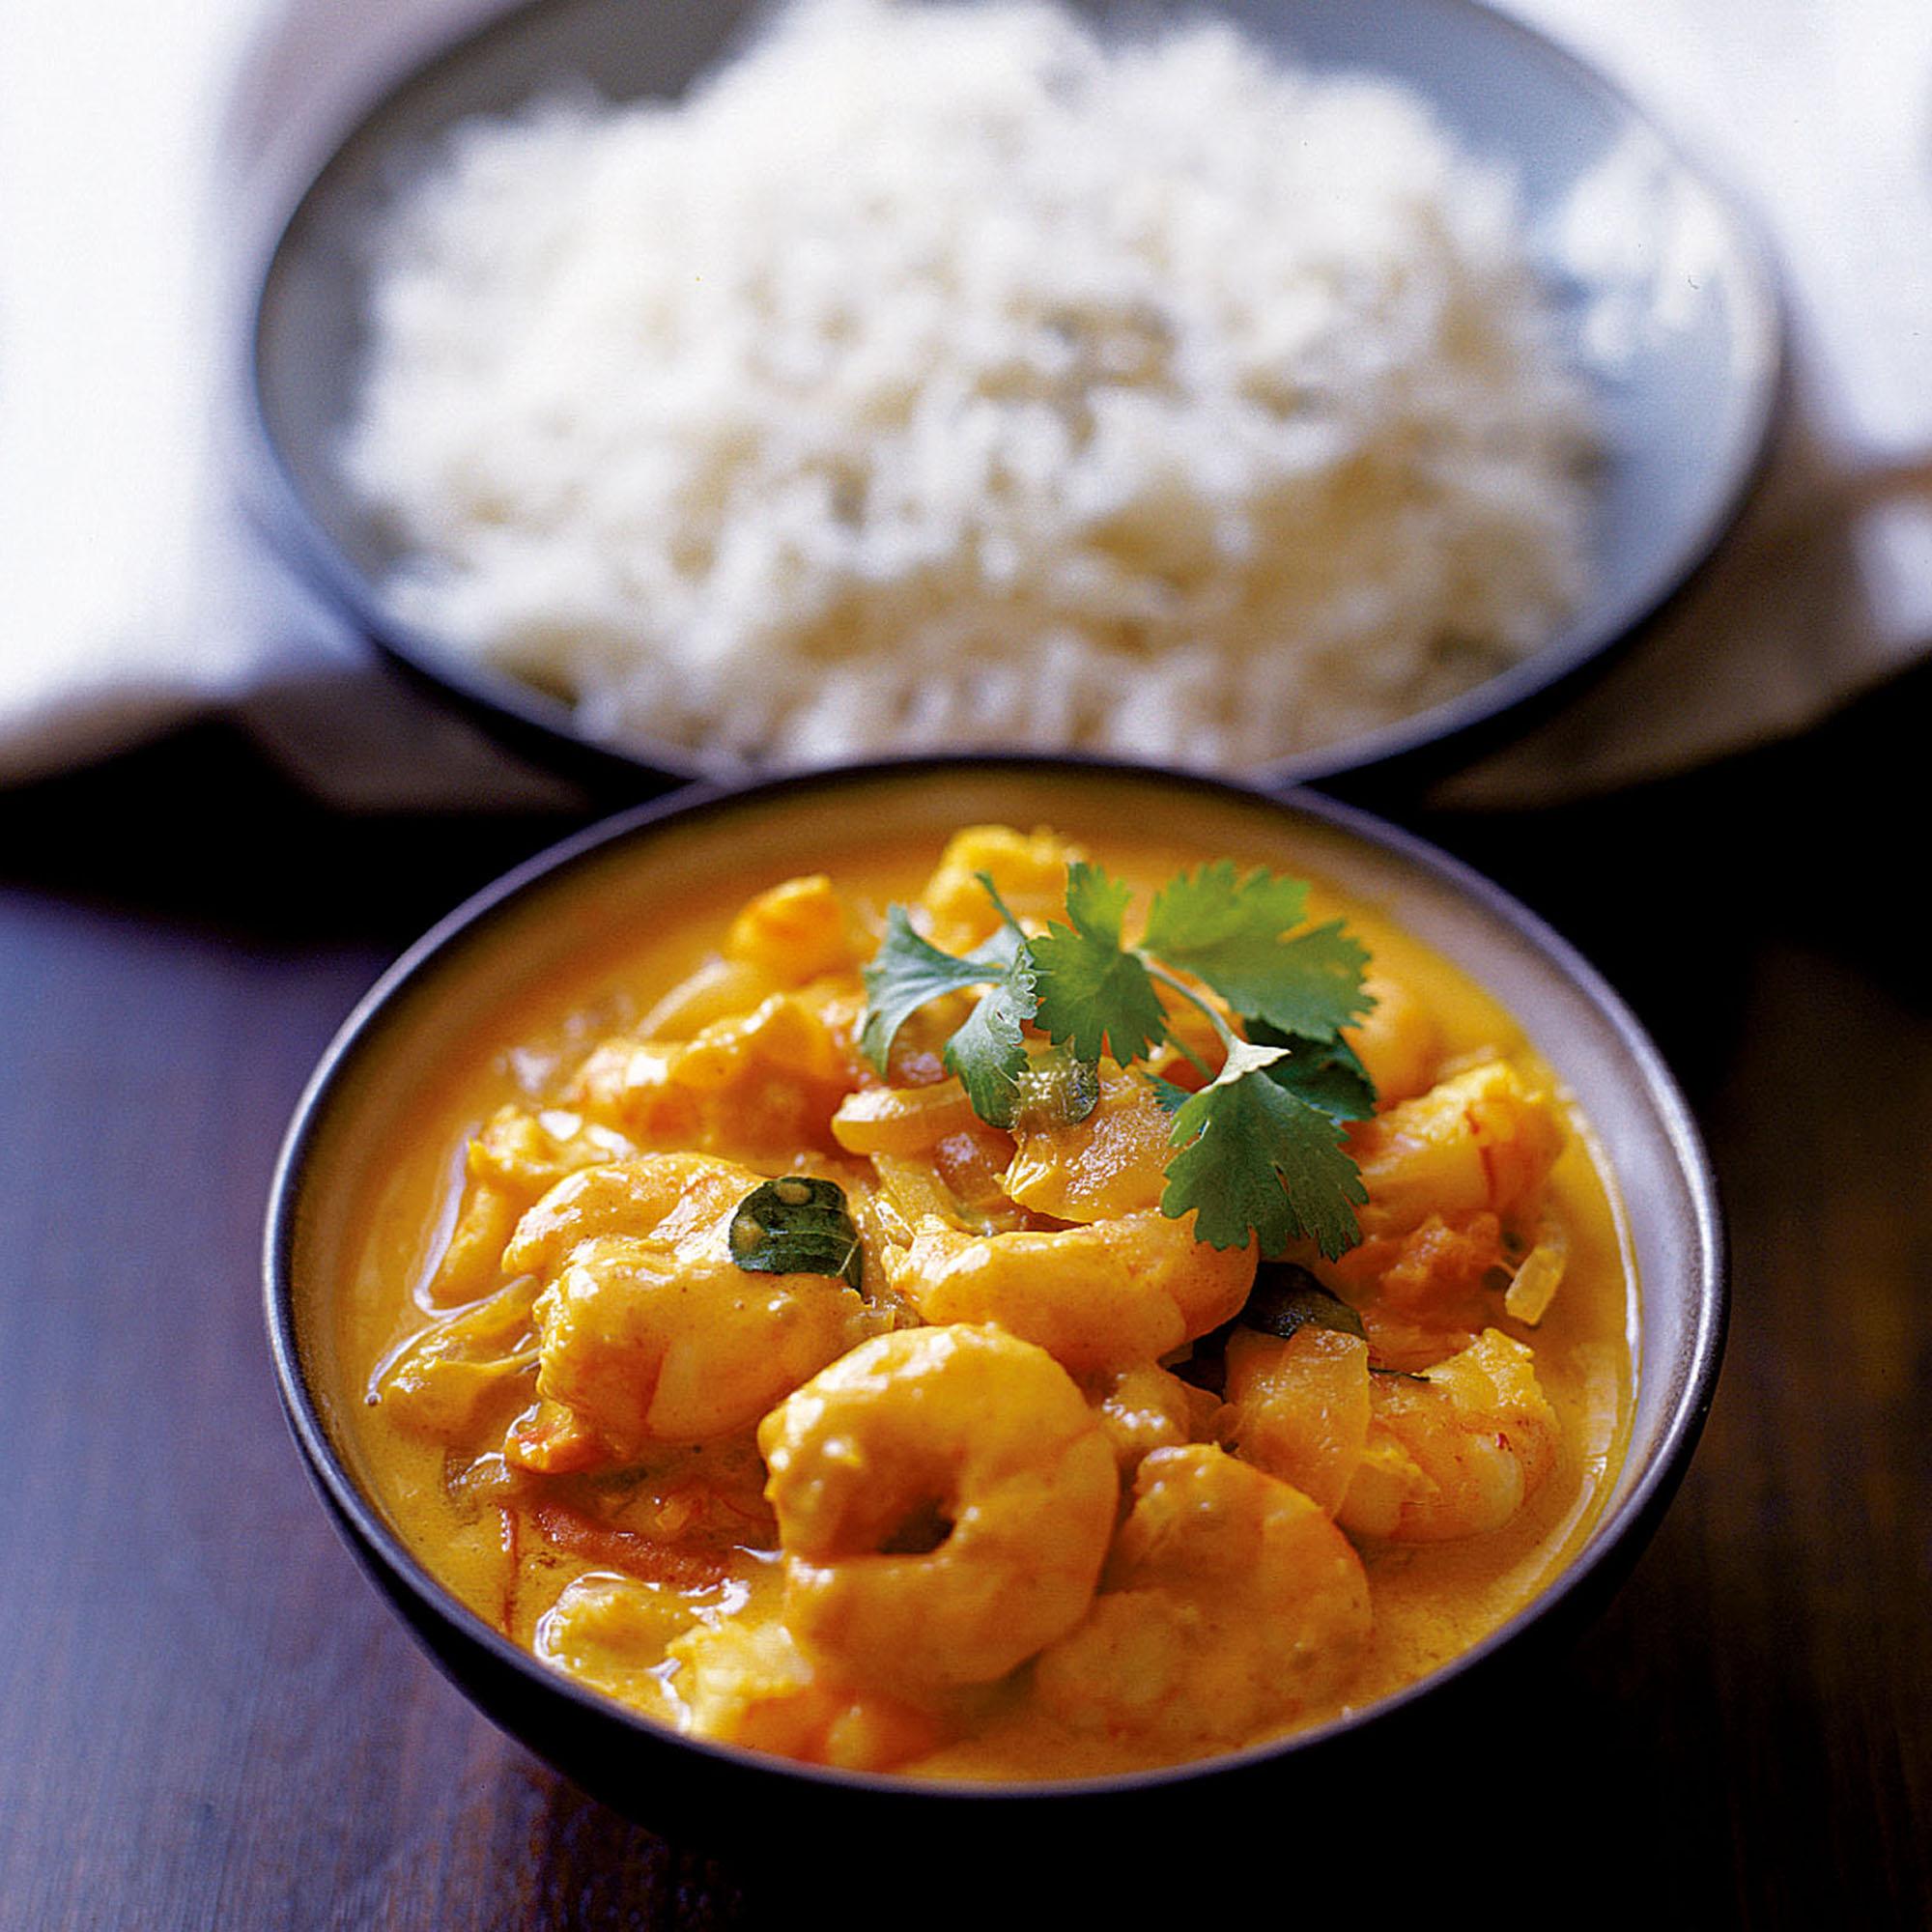 Recipes With Chicken Lemon And Garlic: Malabar Prawn Curry